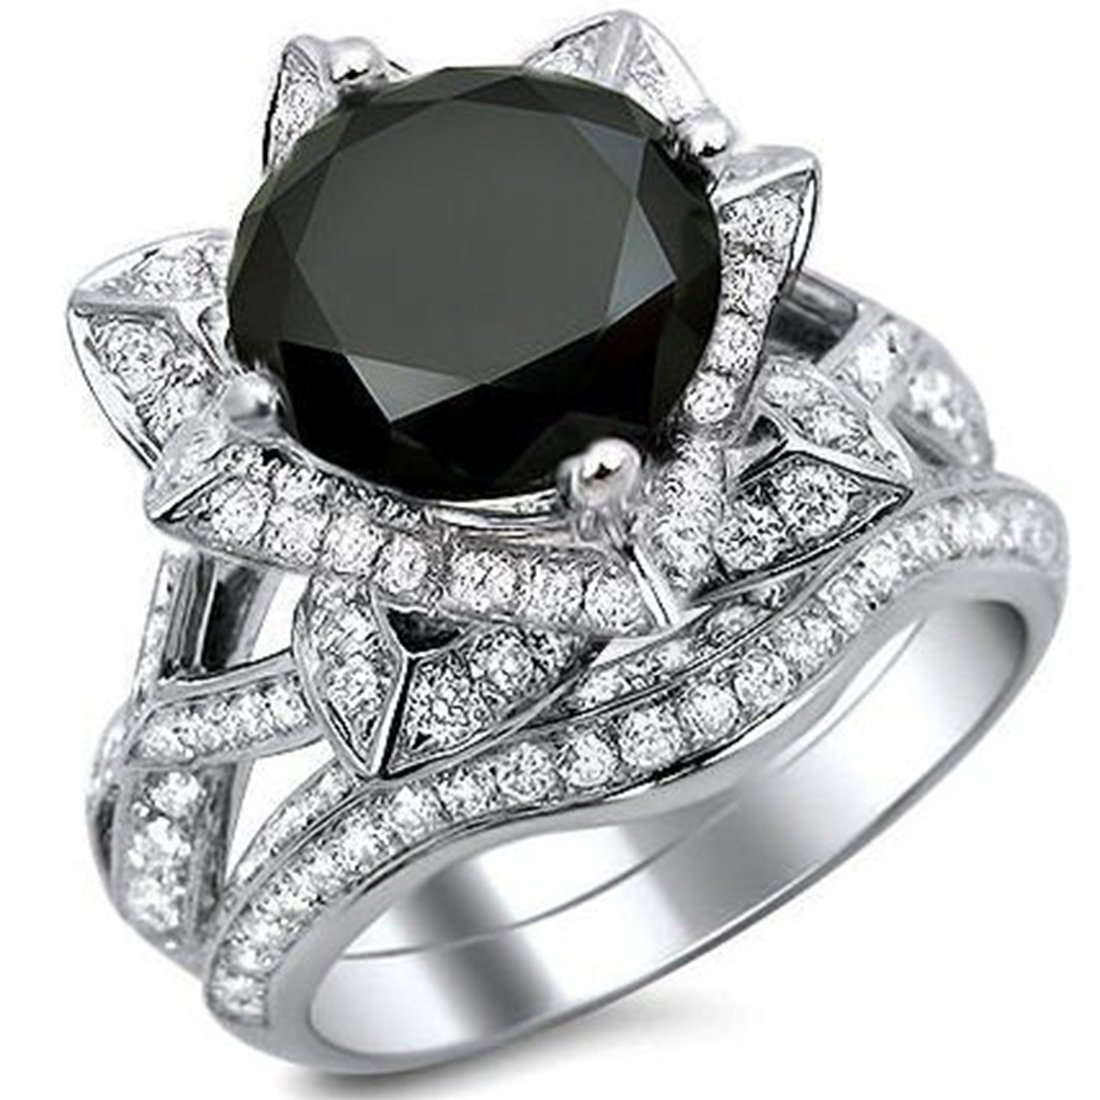 Smjewels 3.60 Ct Black Round Sim.Diamond Lotus Flower Engagement Ring Set In 14K White Gold Fn